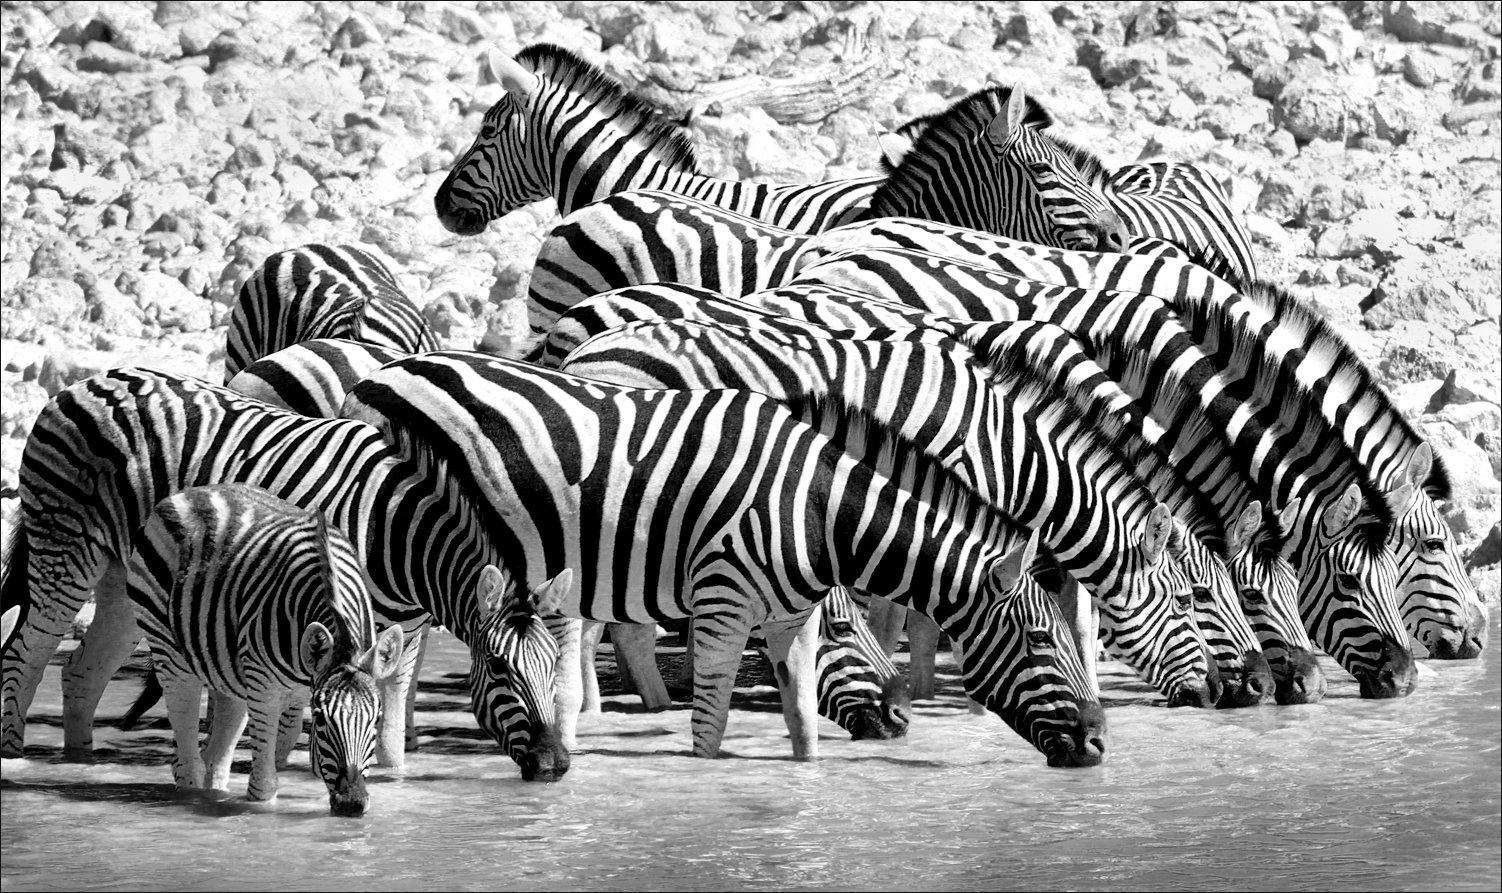 зебры, африка, путешествие, черно-белая, чб, zebras, africa, travel, black and white, bw, Вера